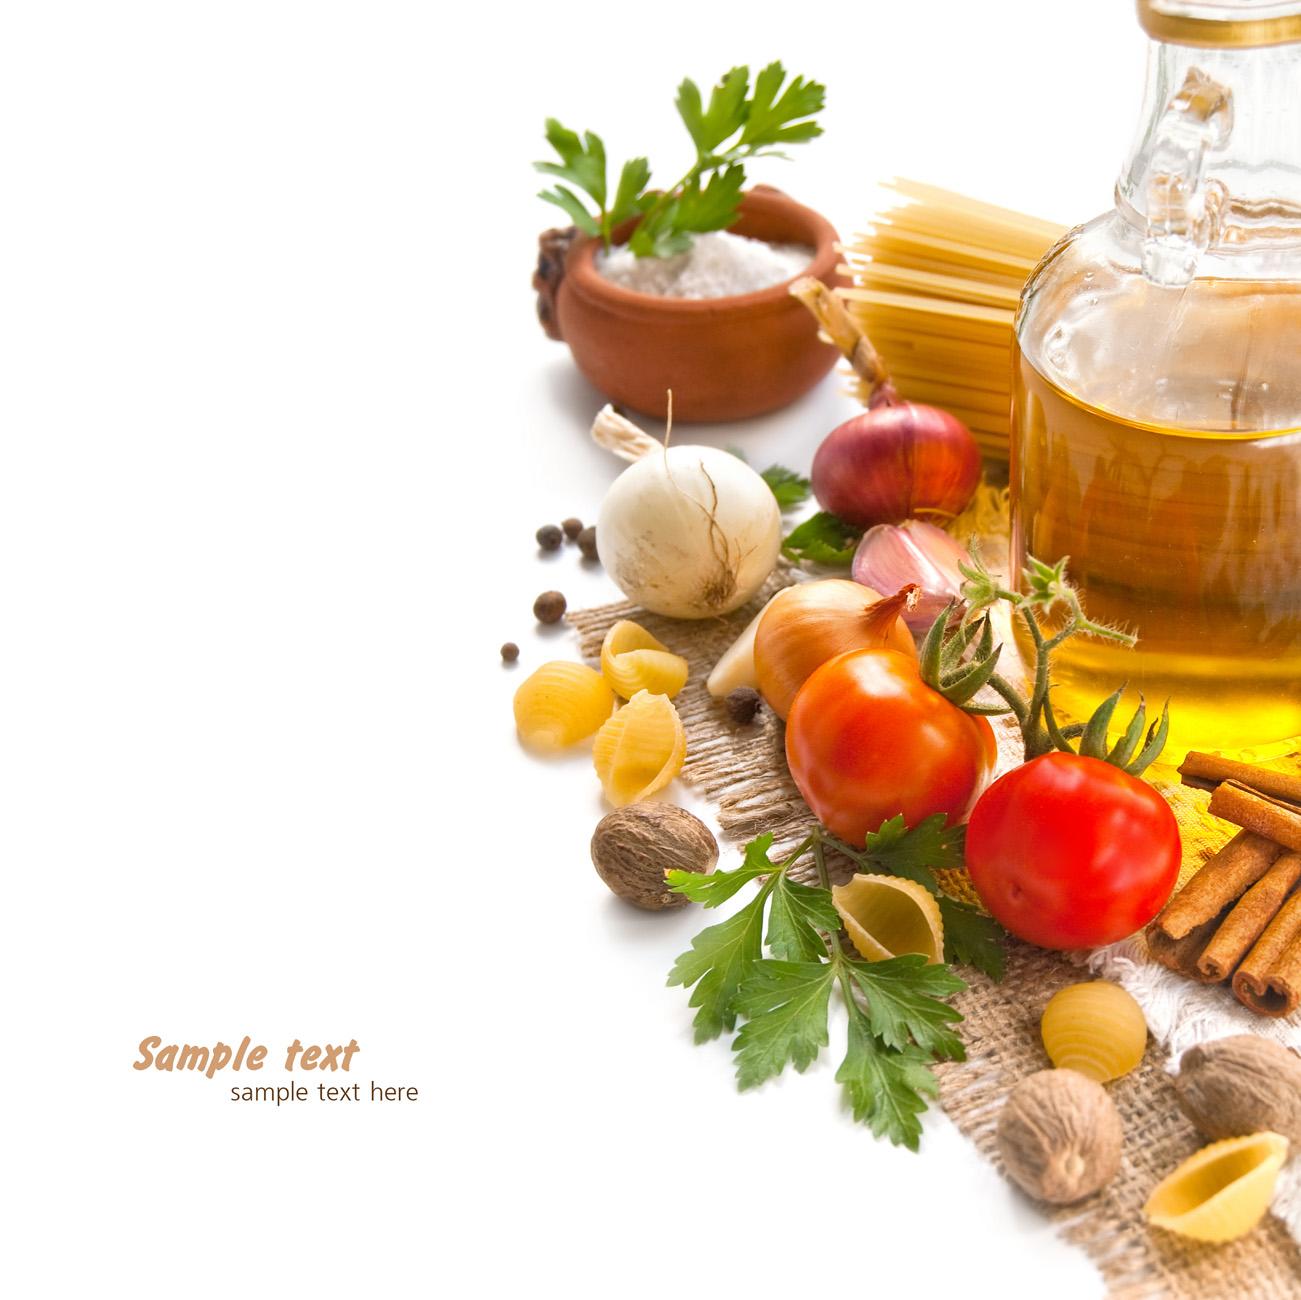 Tamara favazza healthy food hd images for Cuisine wallpaper